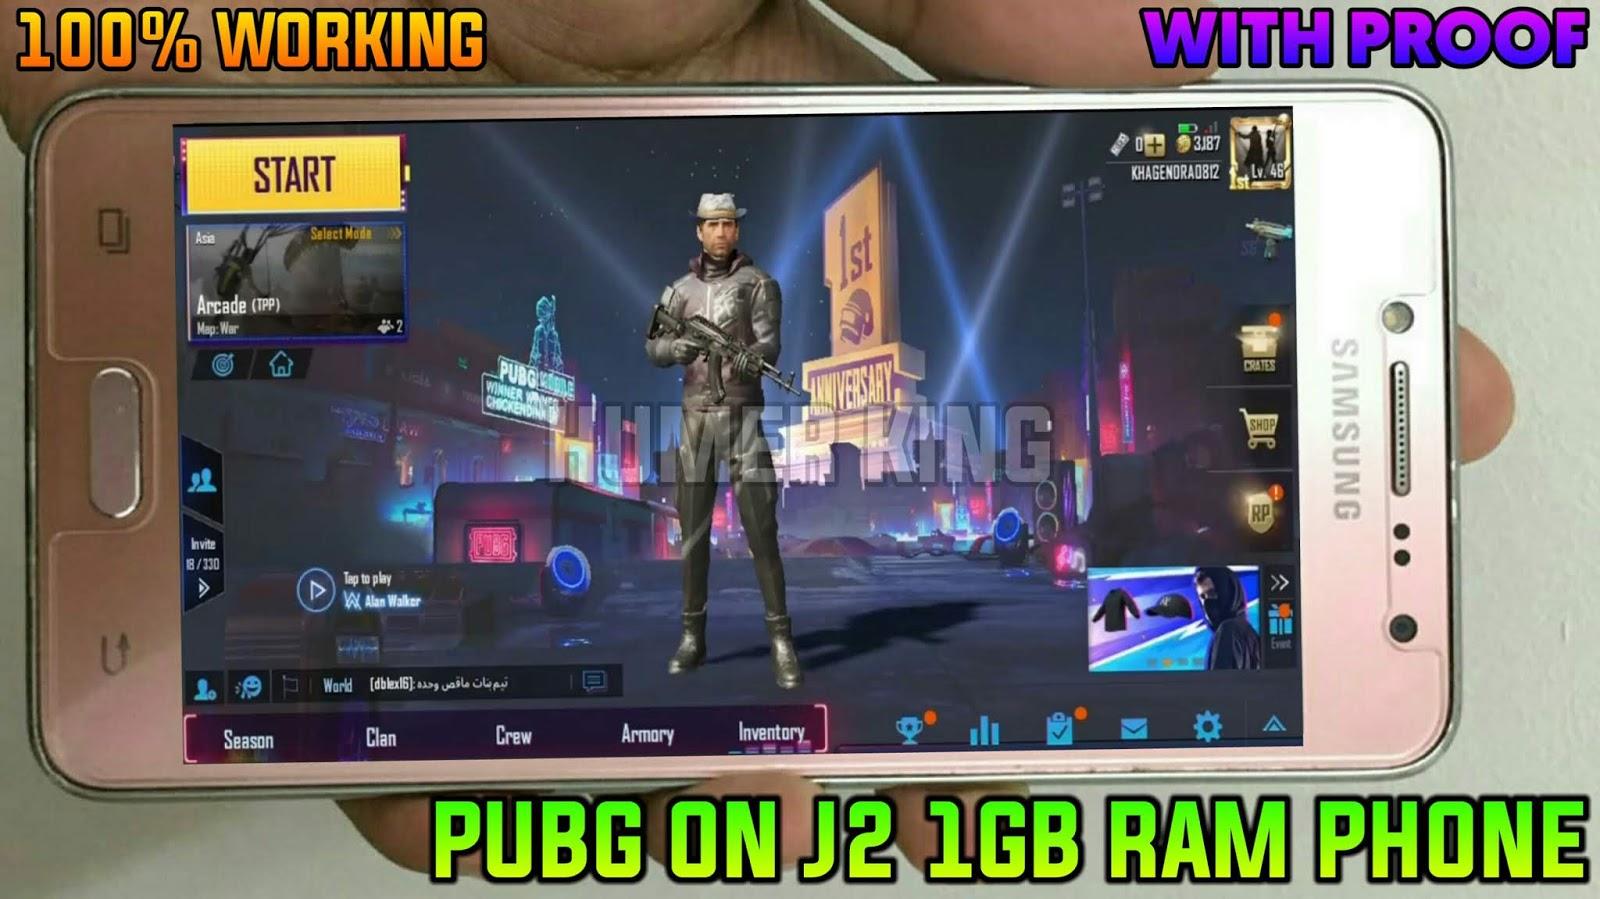 PLAY PUBG ON J2 1GB RAM PHONE 100% WORKING - HUMER KING